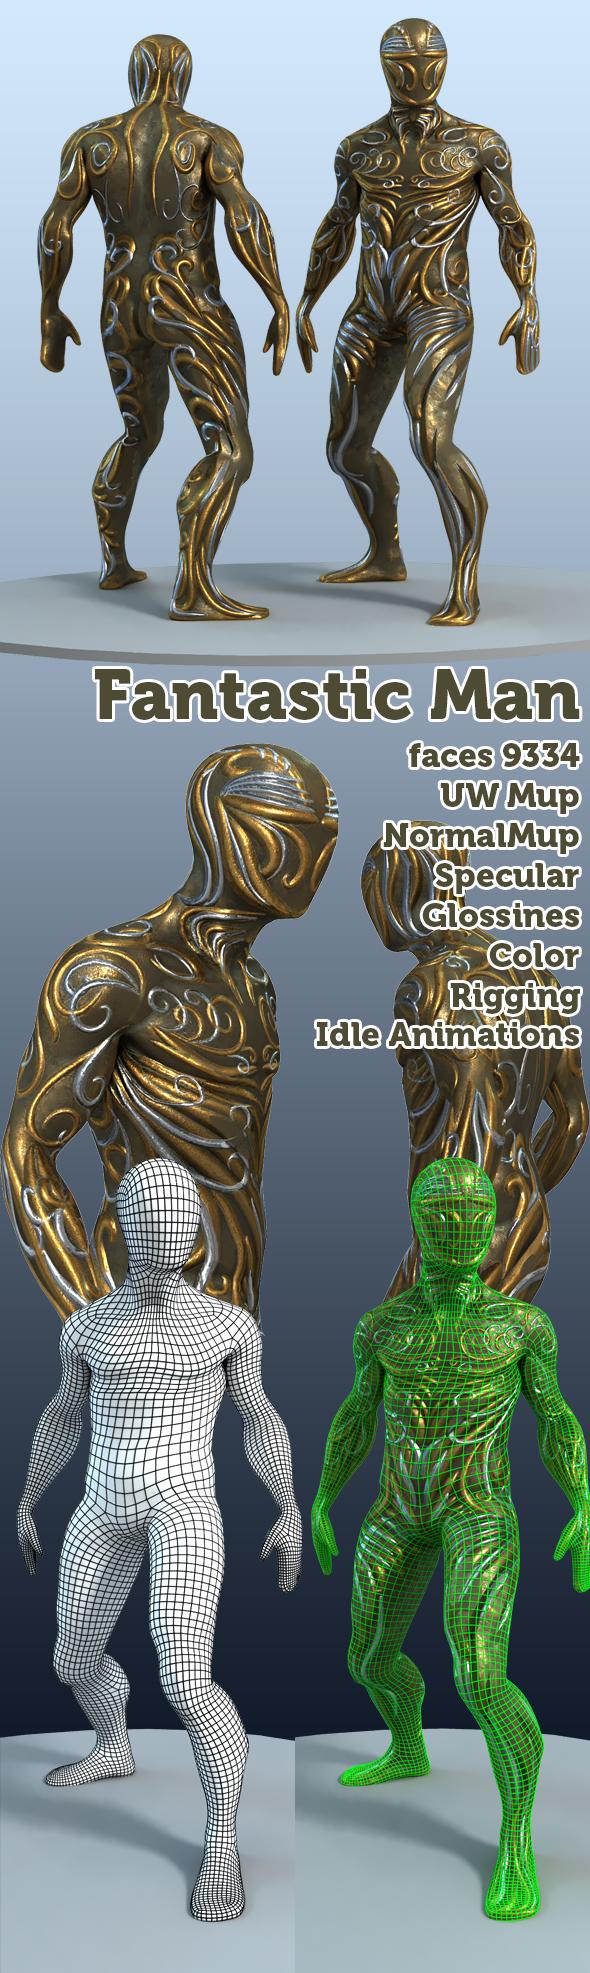 Fantastic man - 3DOcean Item for Sale